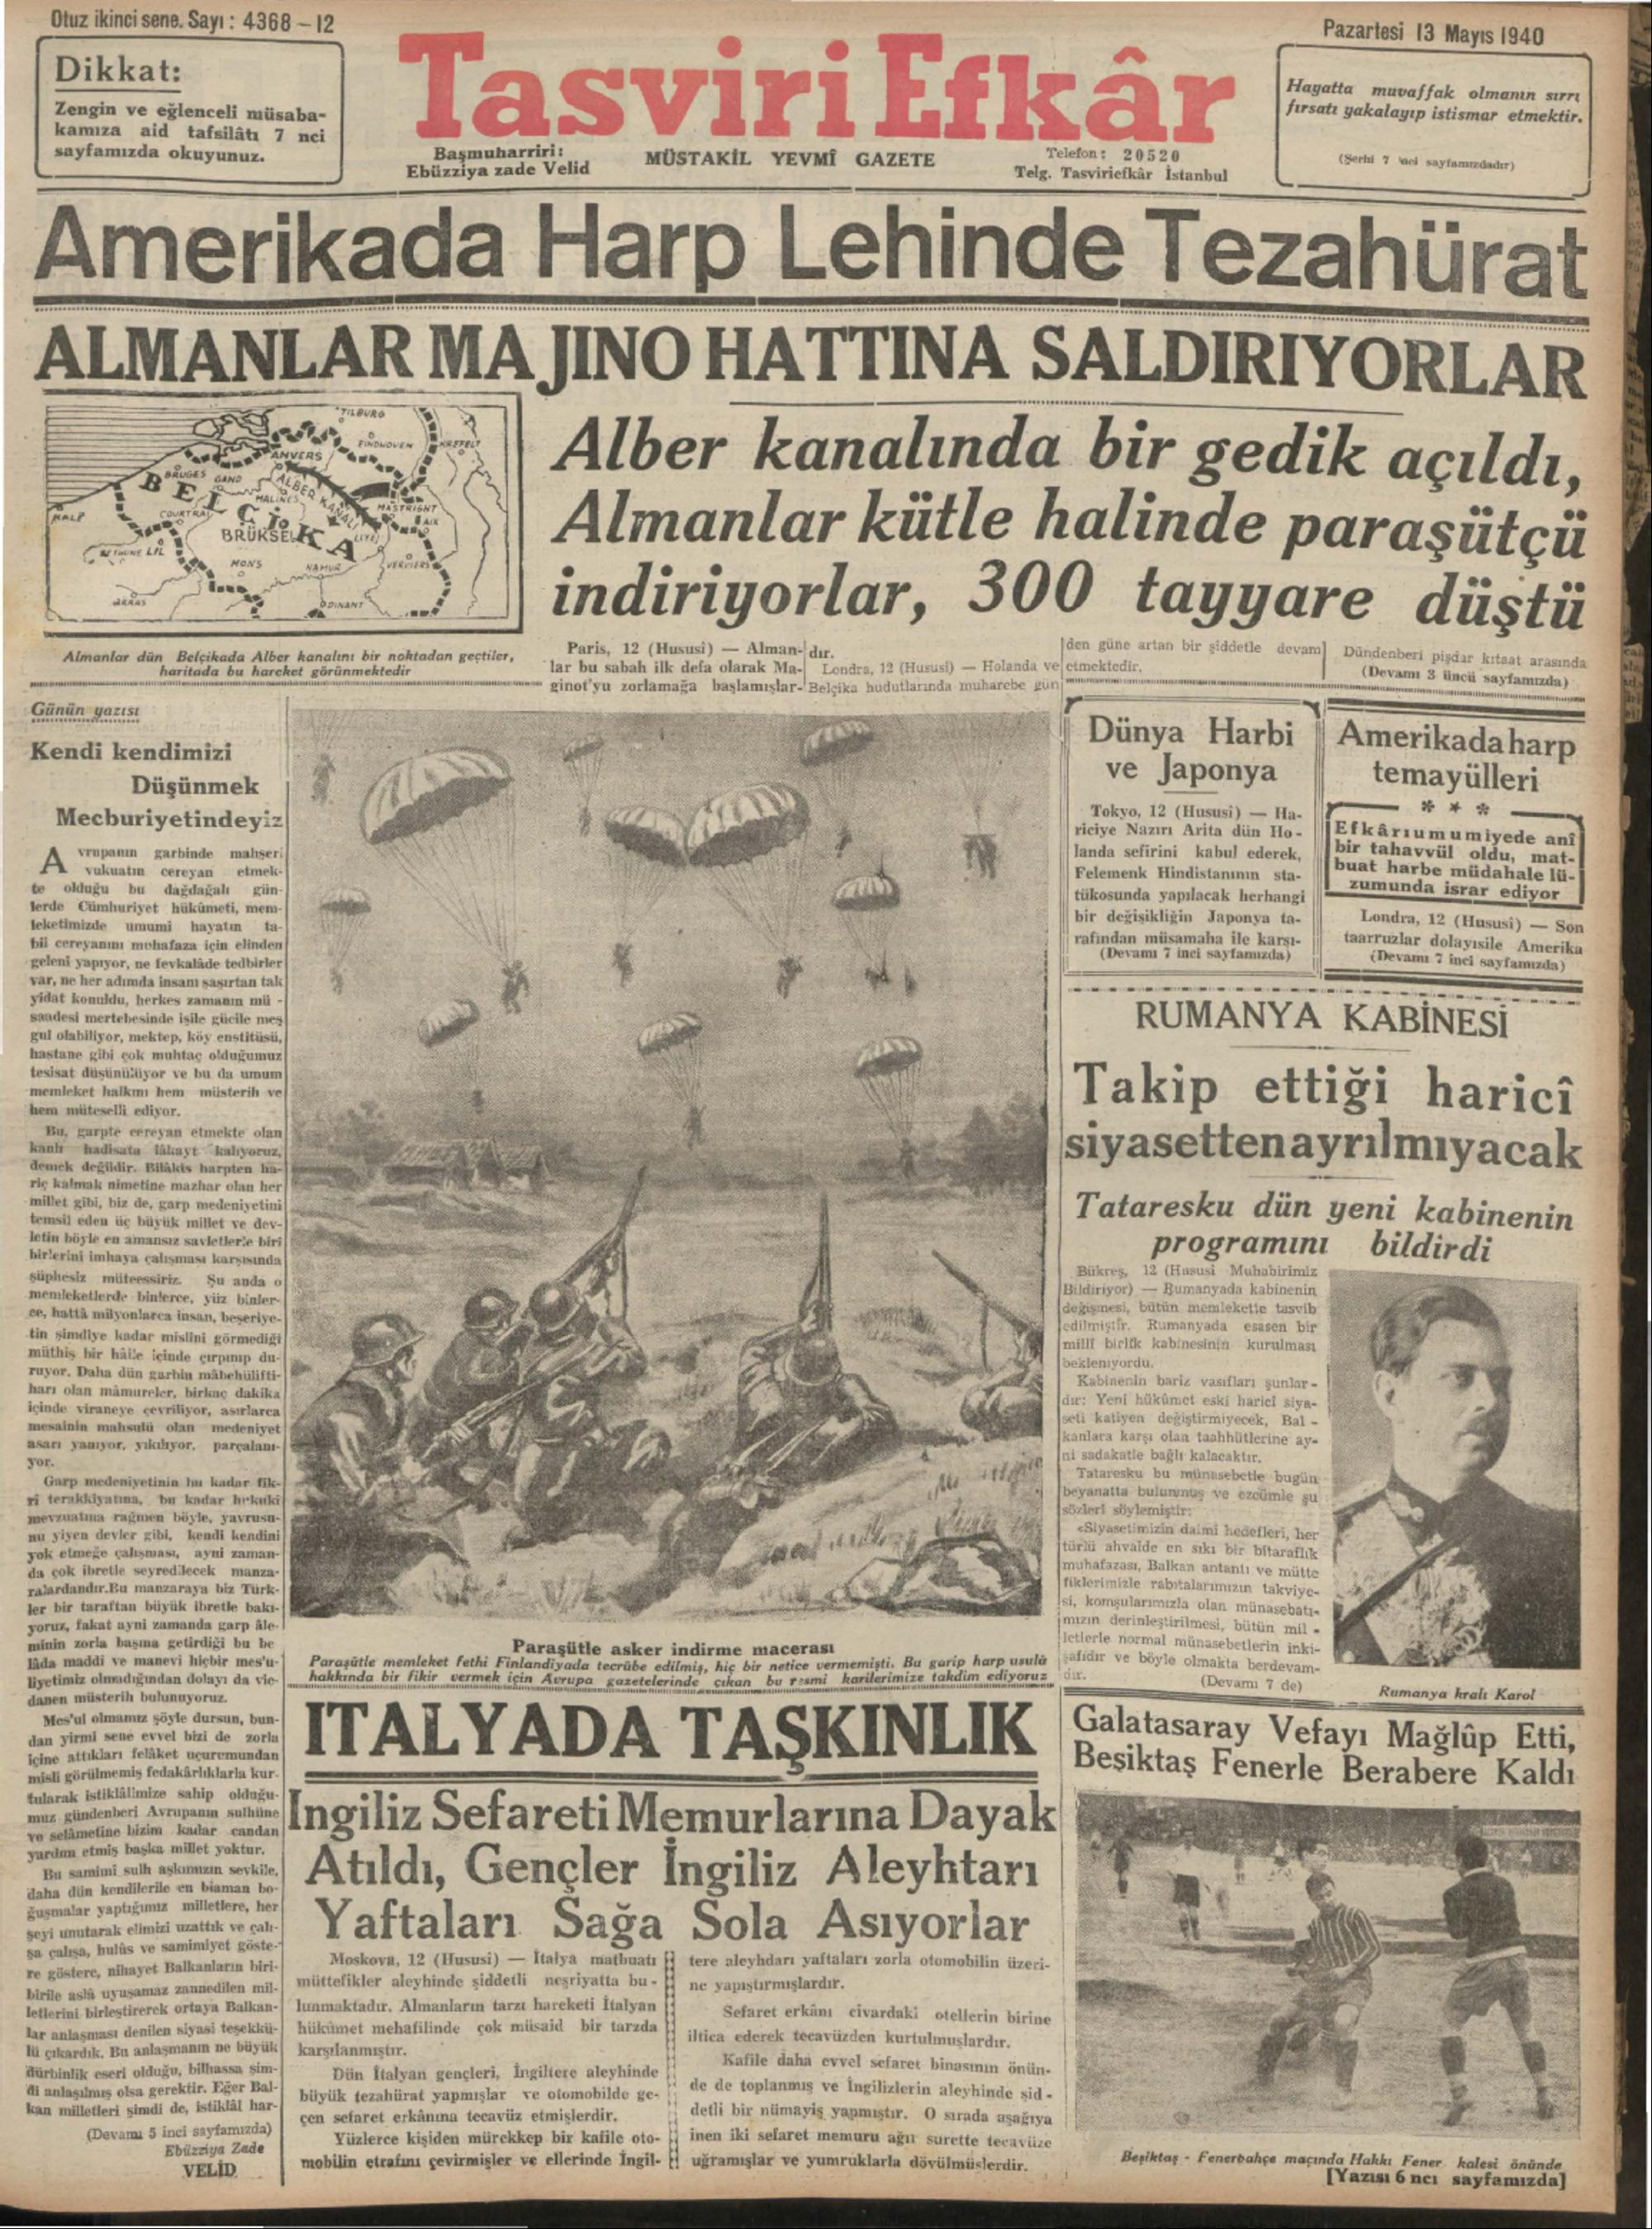 13 Mayıs 1940 Tarihli Tasviri Efkar Gazetesi Sayfa 1